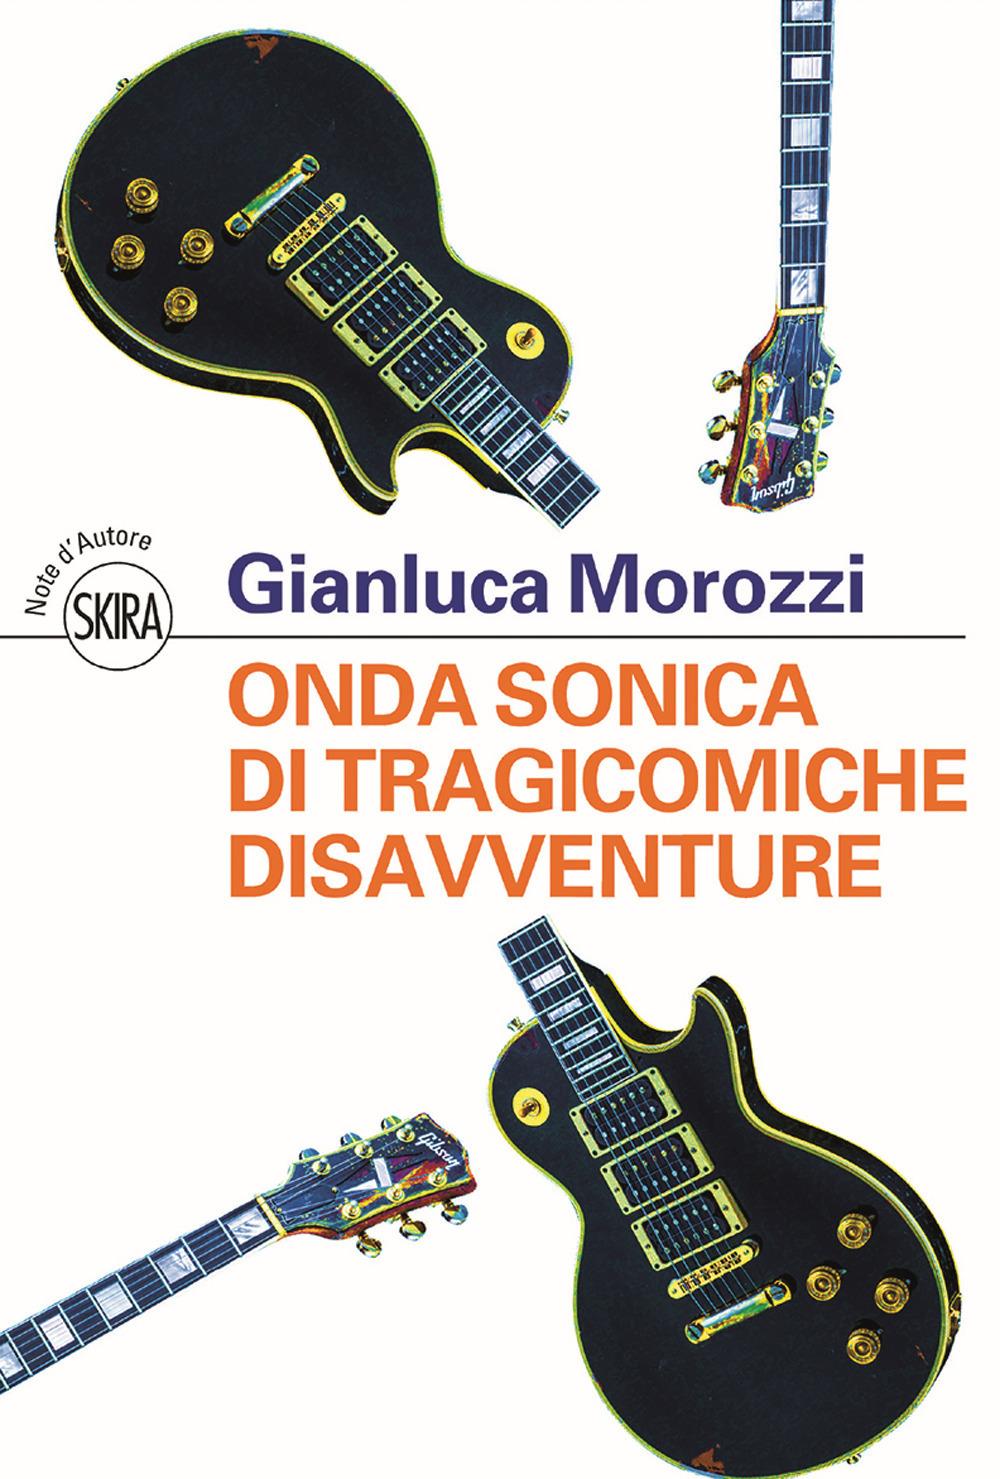 Onda sonica – Gianluca Morozzi